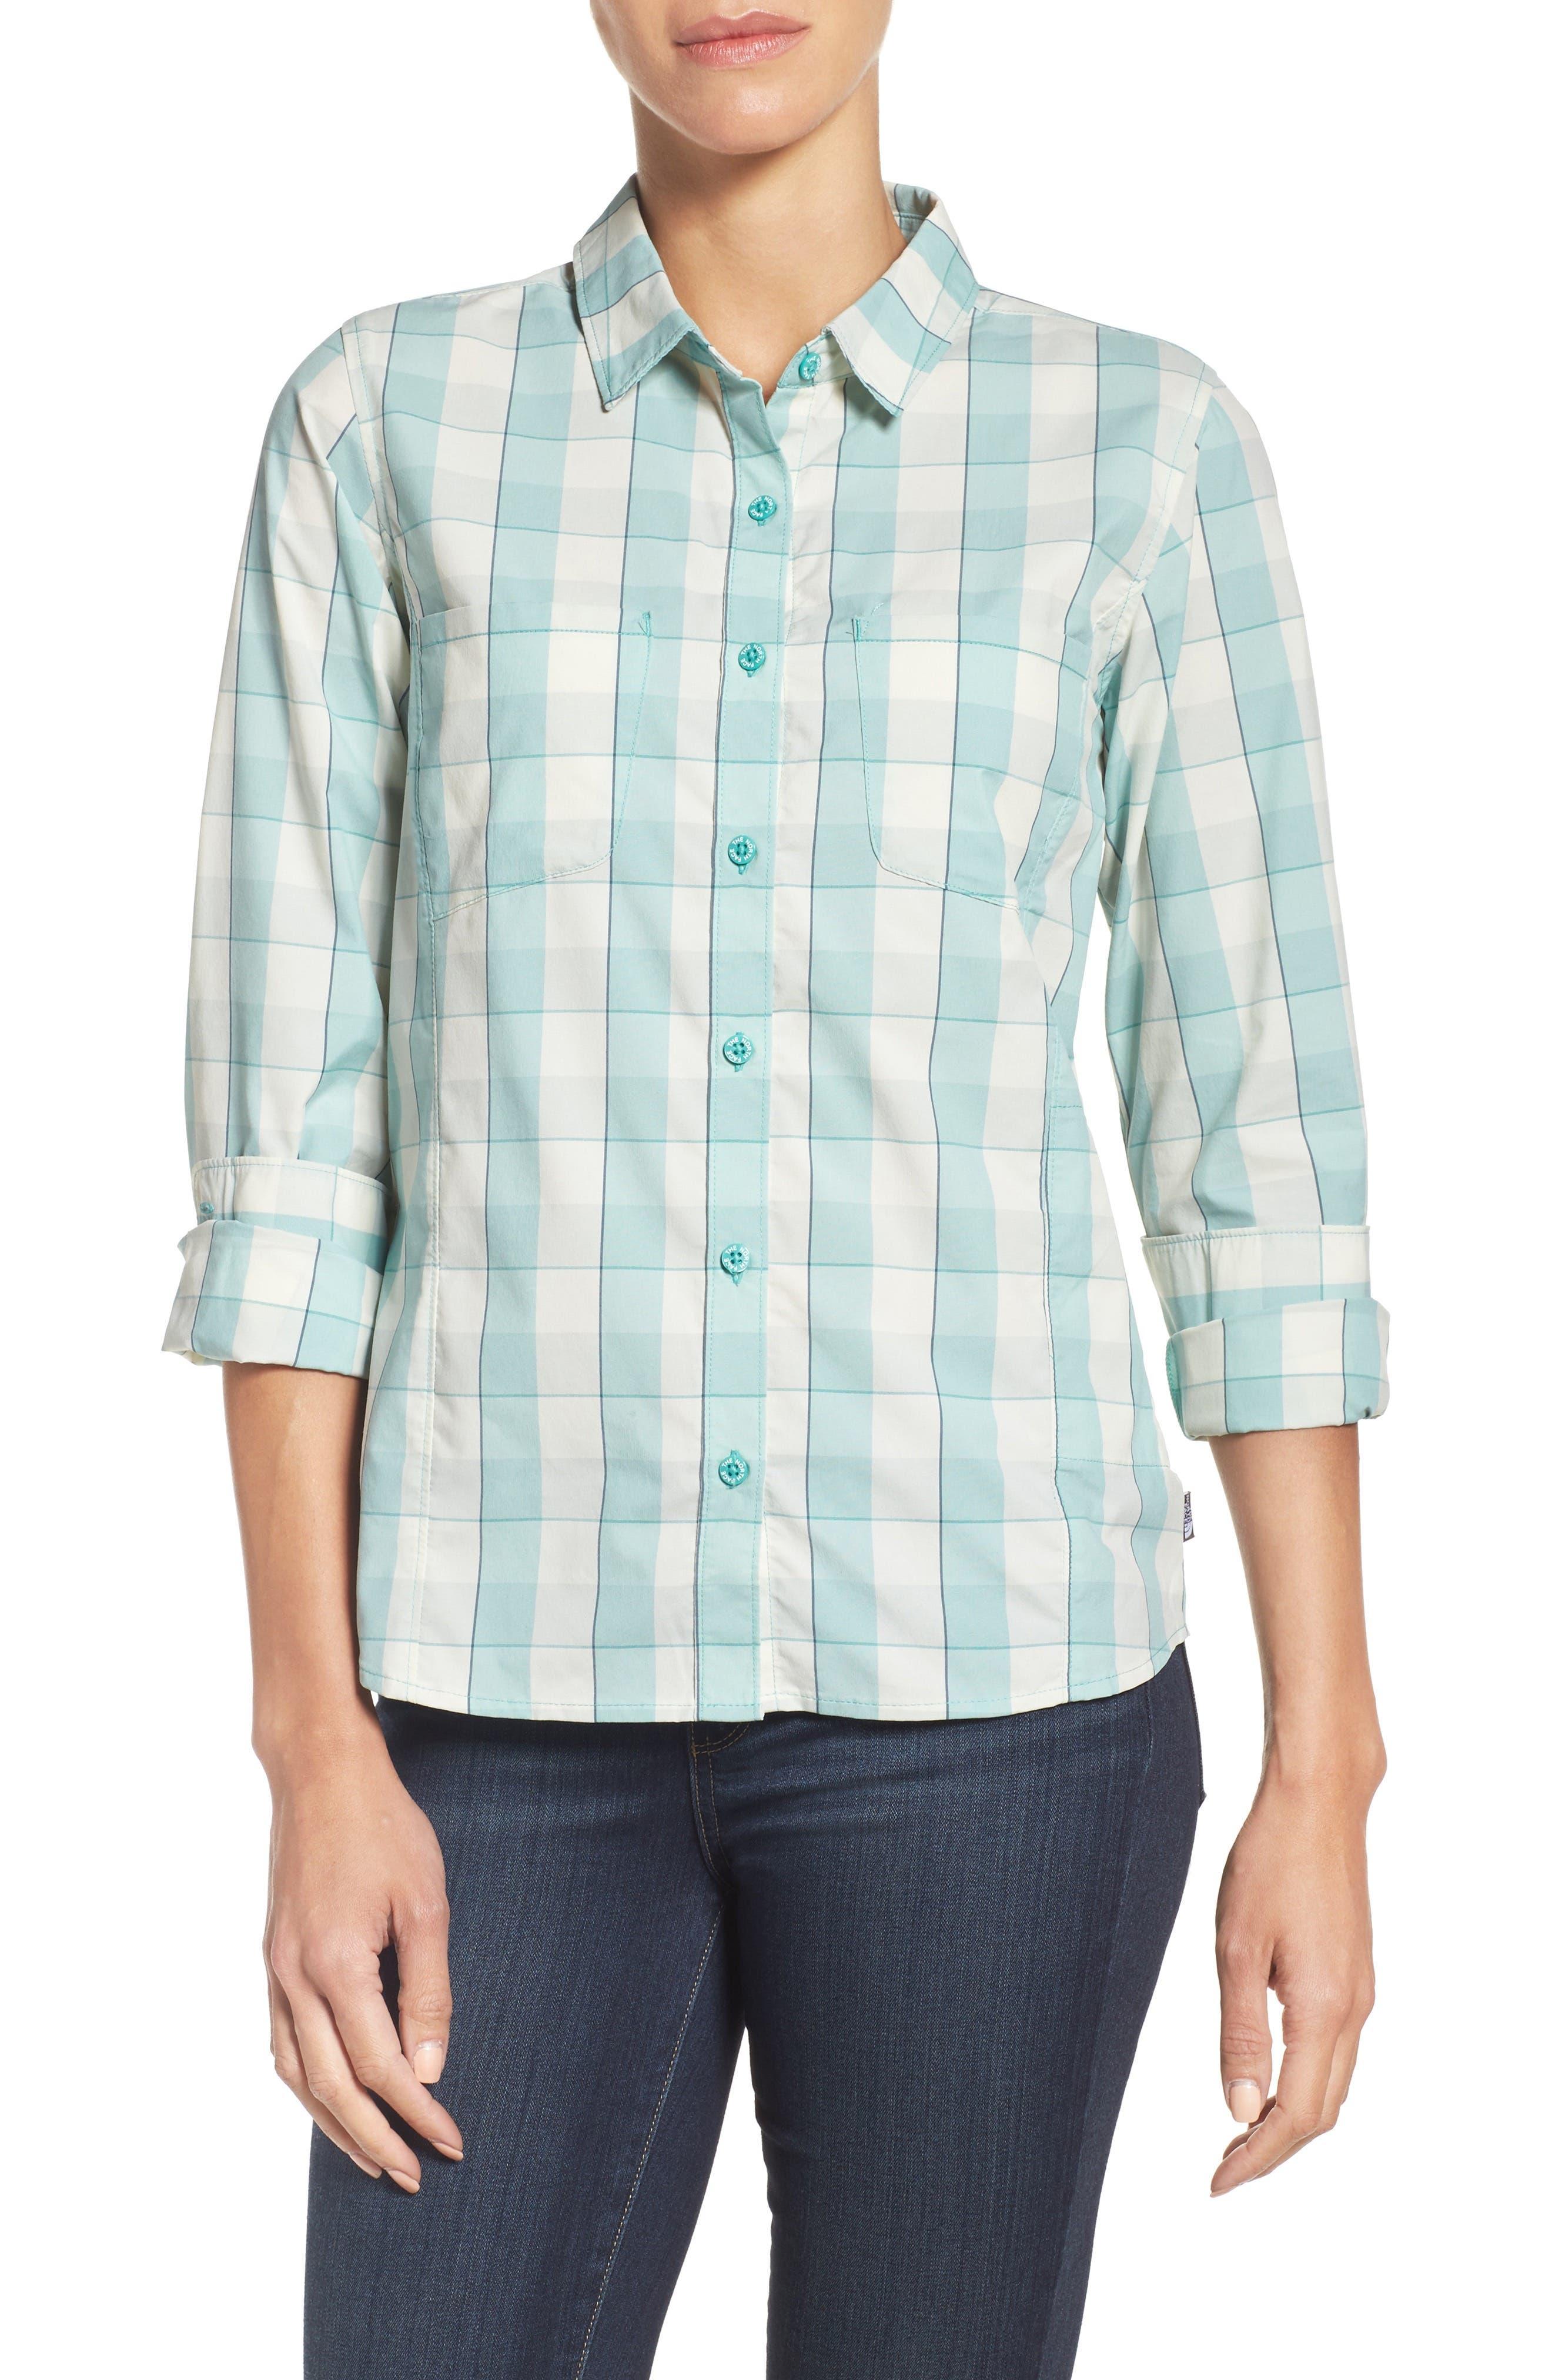 Sunblocker Twill Shirt,                         Main,                         color, Agate Green Plaid